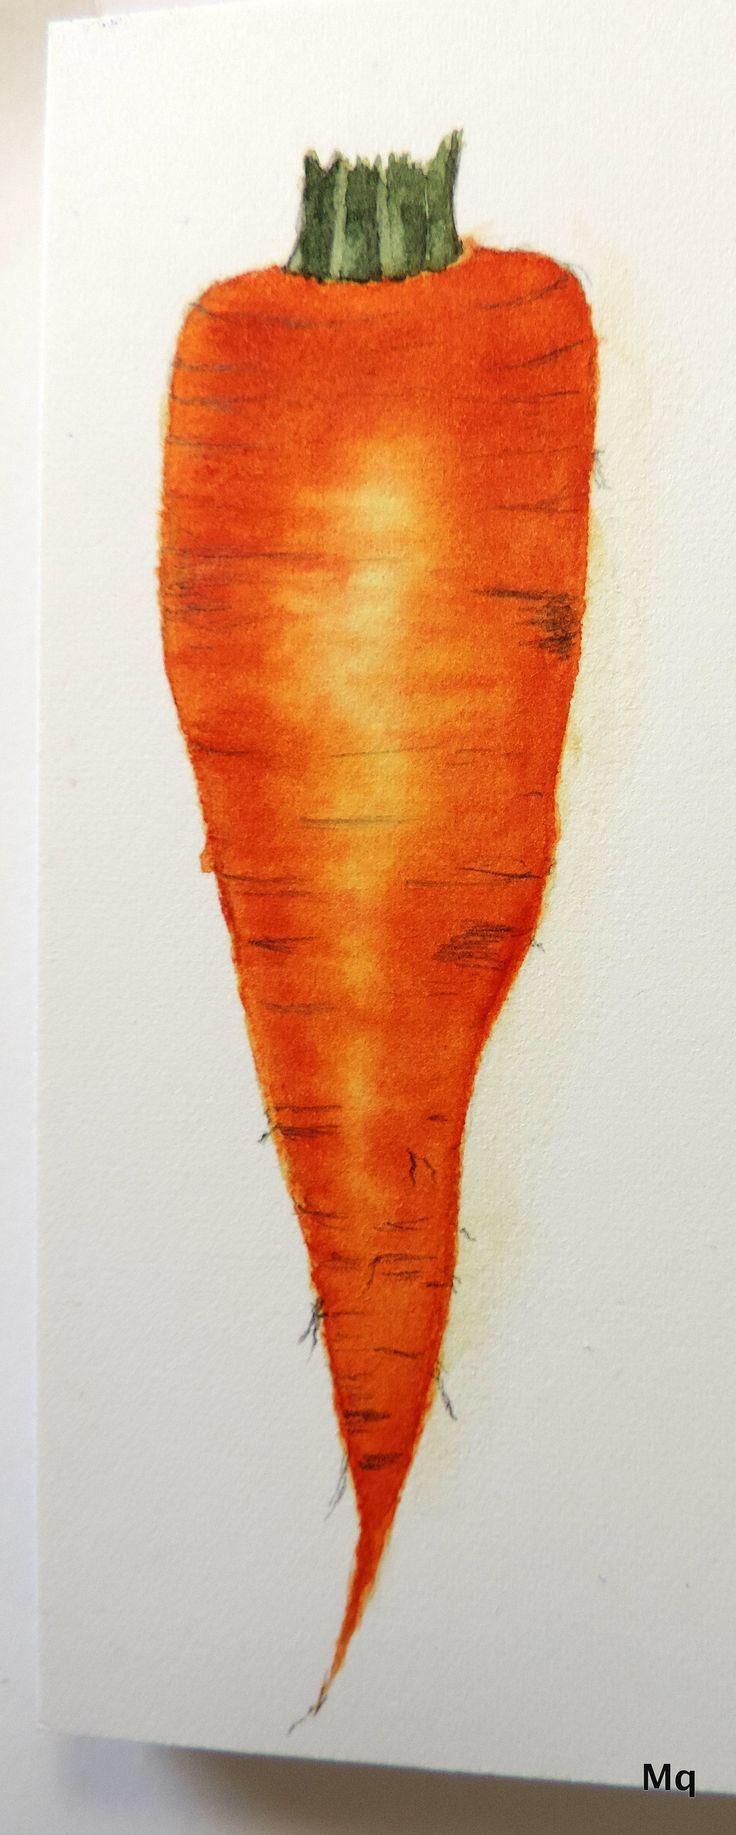 Wortel in aquarel 22-7-2017  11x3,5 cm   Carrot in watercolor